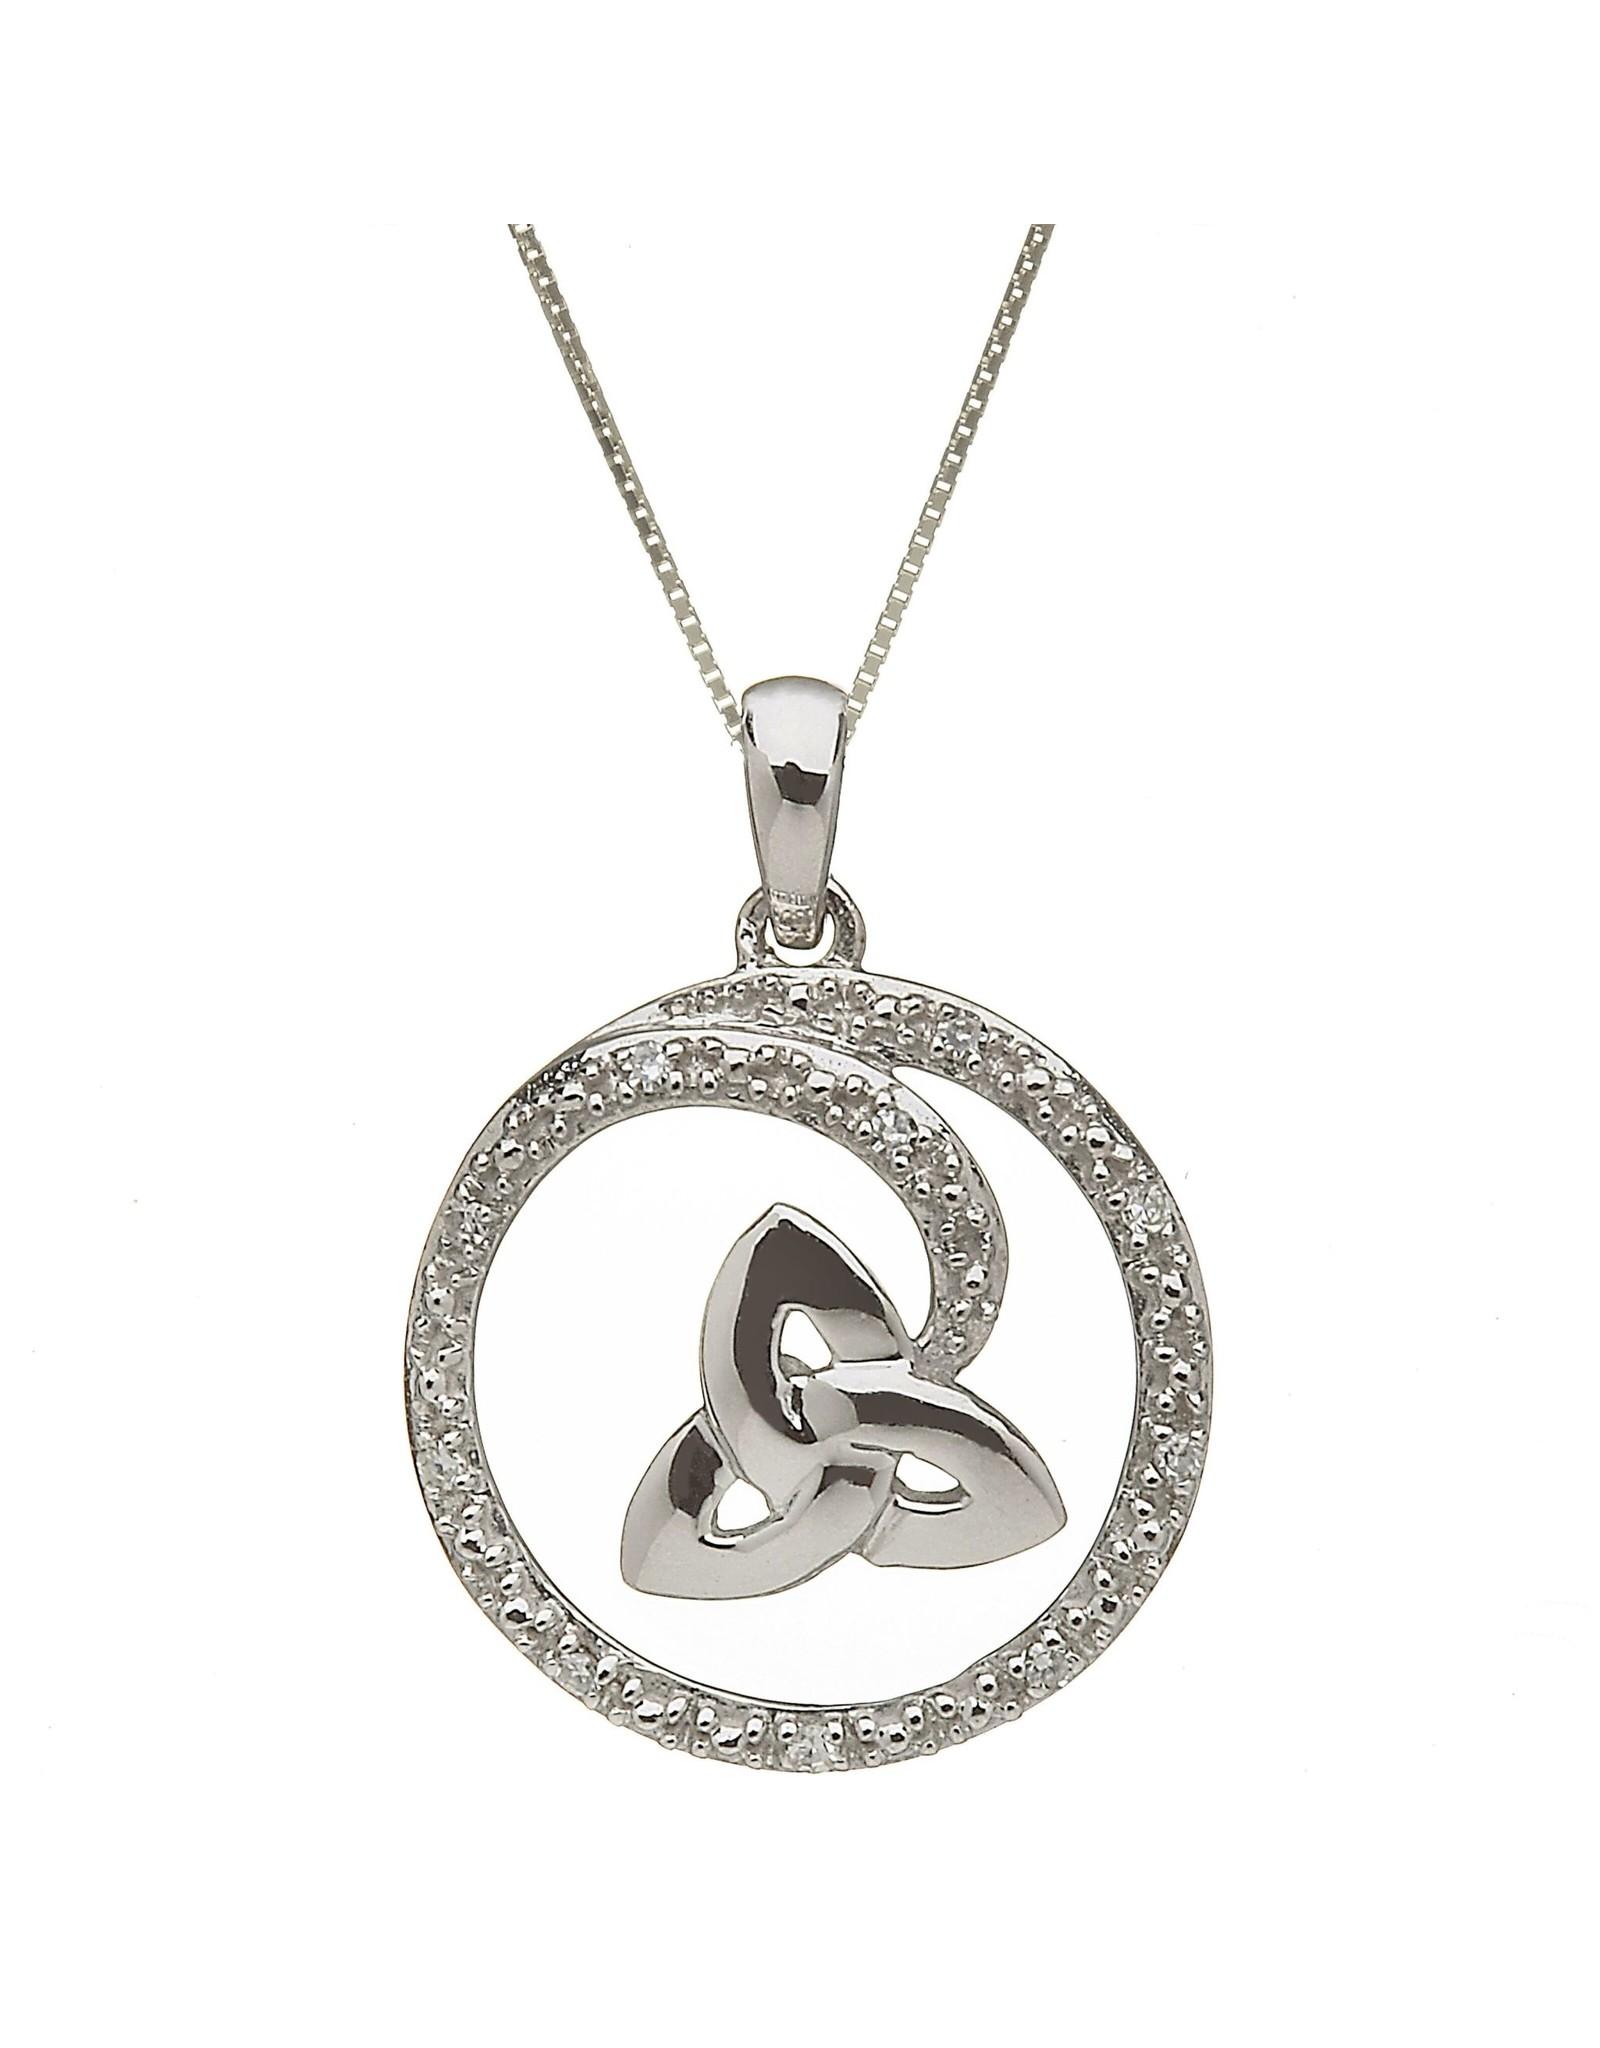 Shanore 10k White Gold Trinity + Diamond Swirl Necklace